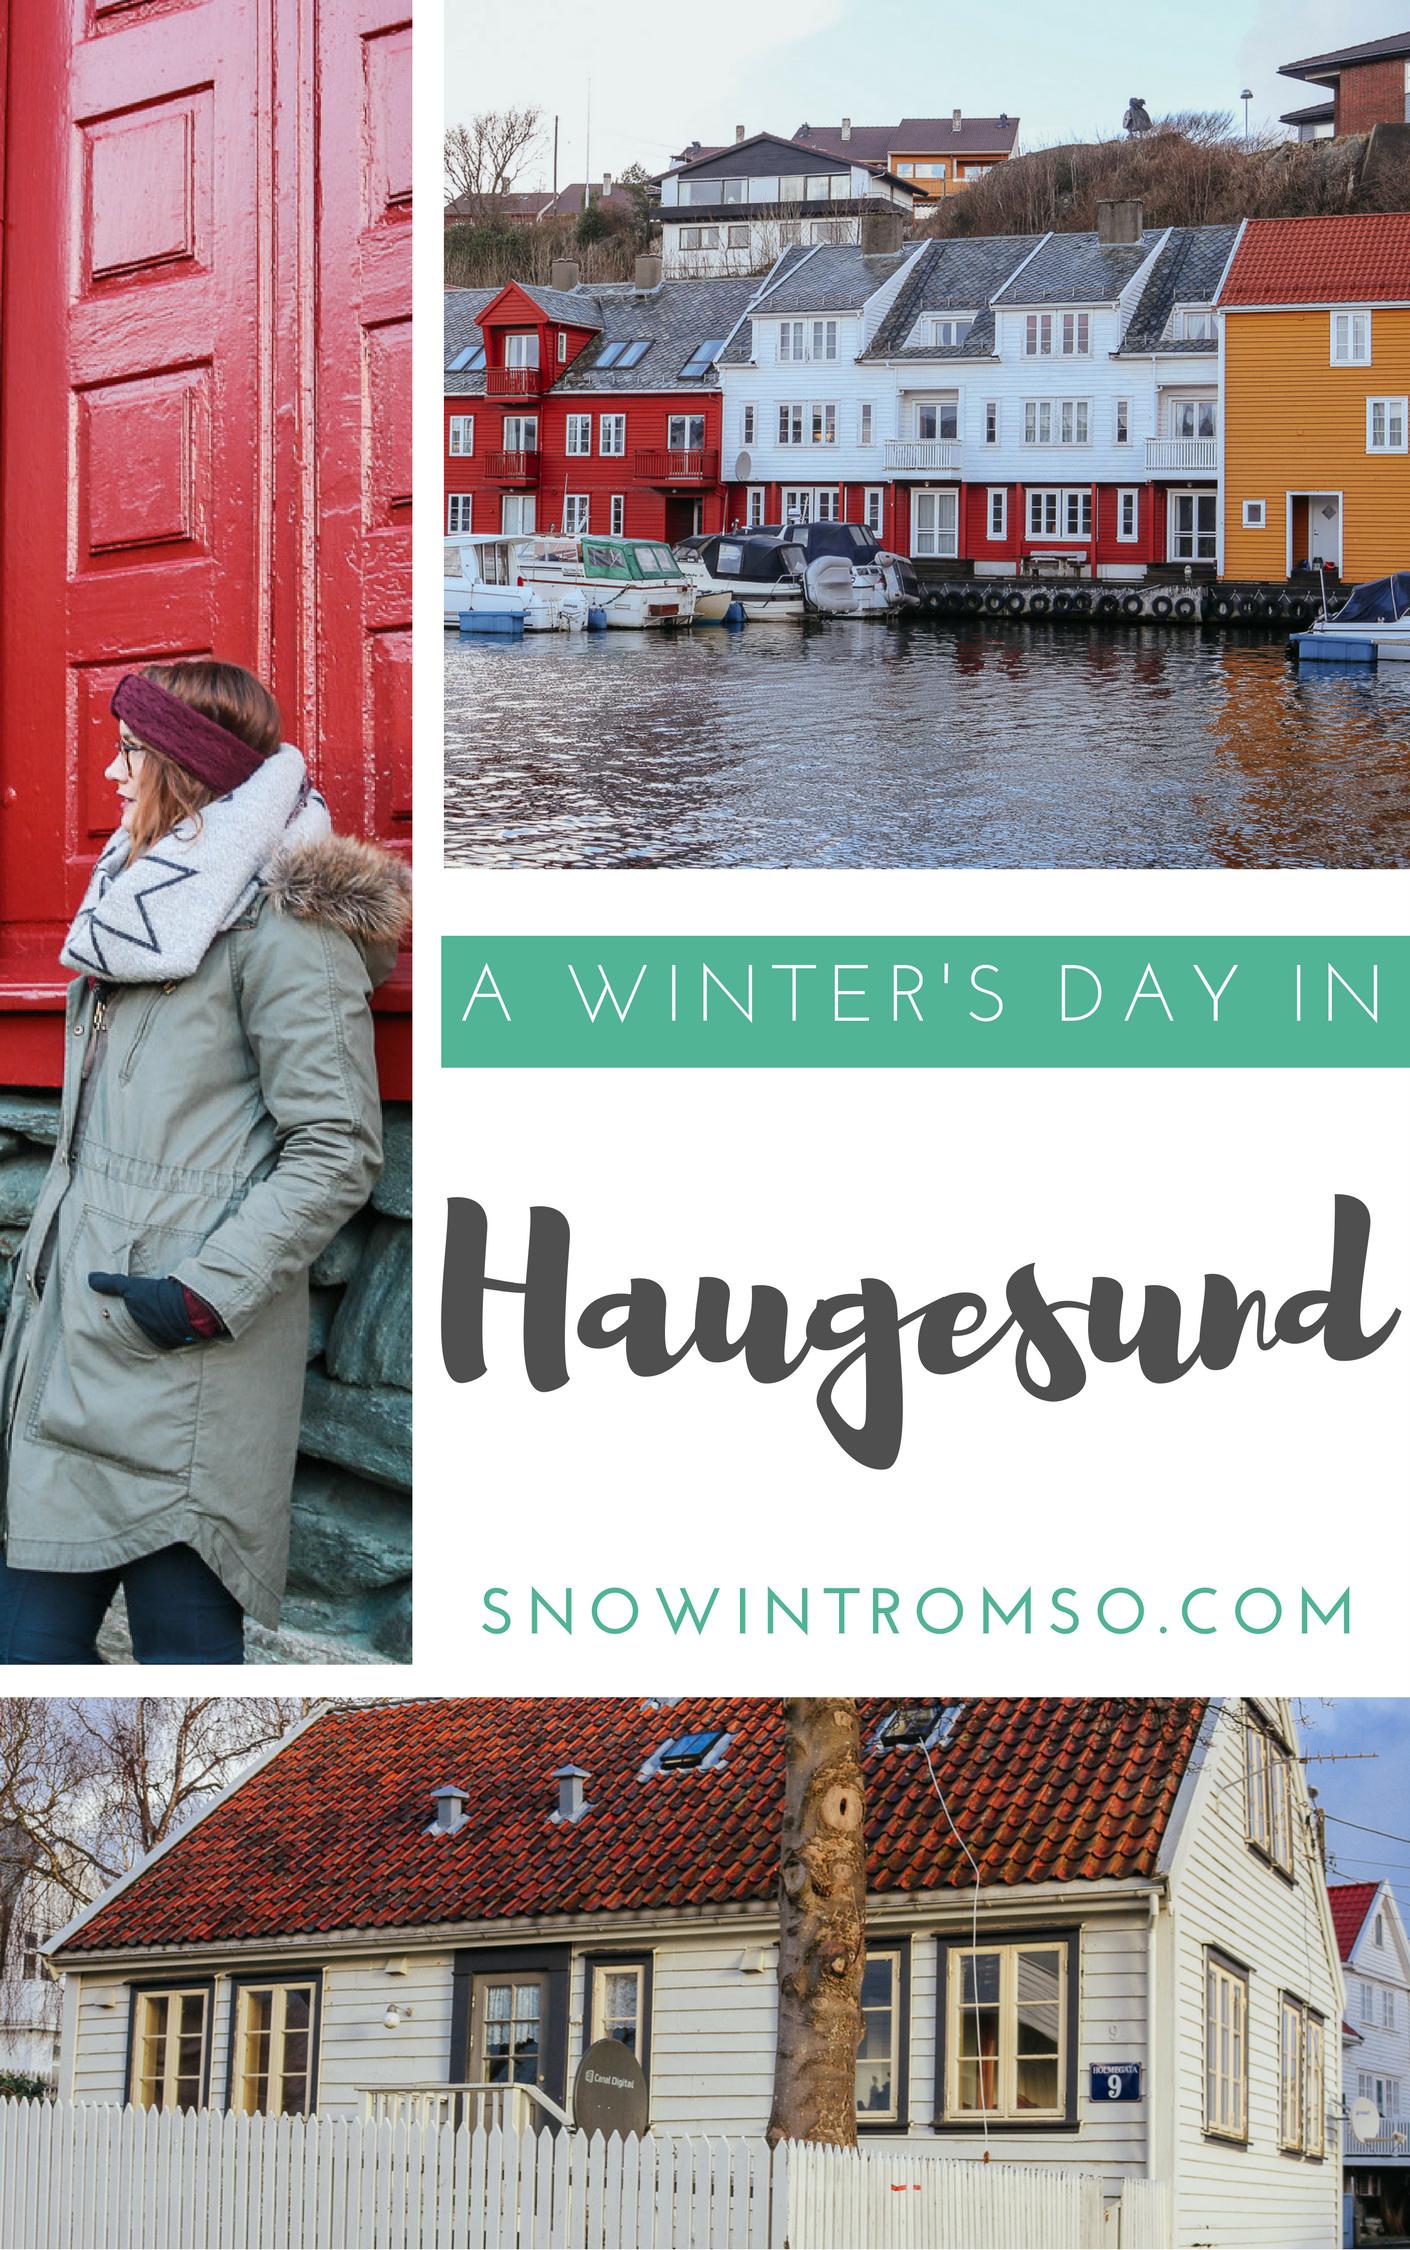 A winter's day in Haugesund on the west coast of Norway